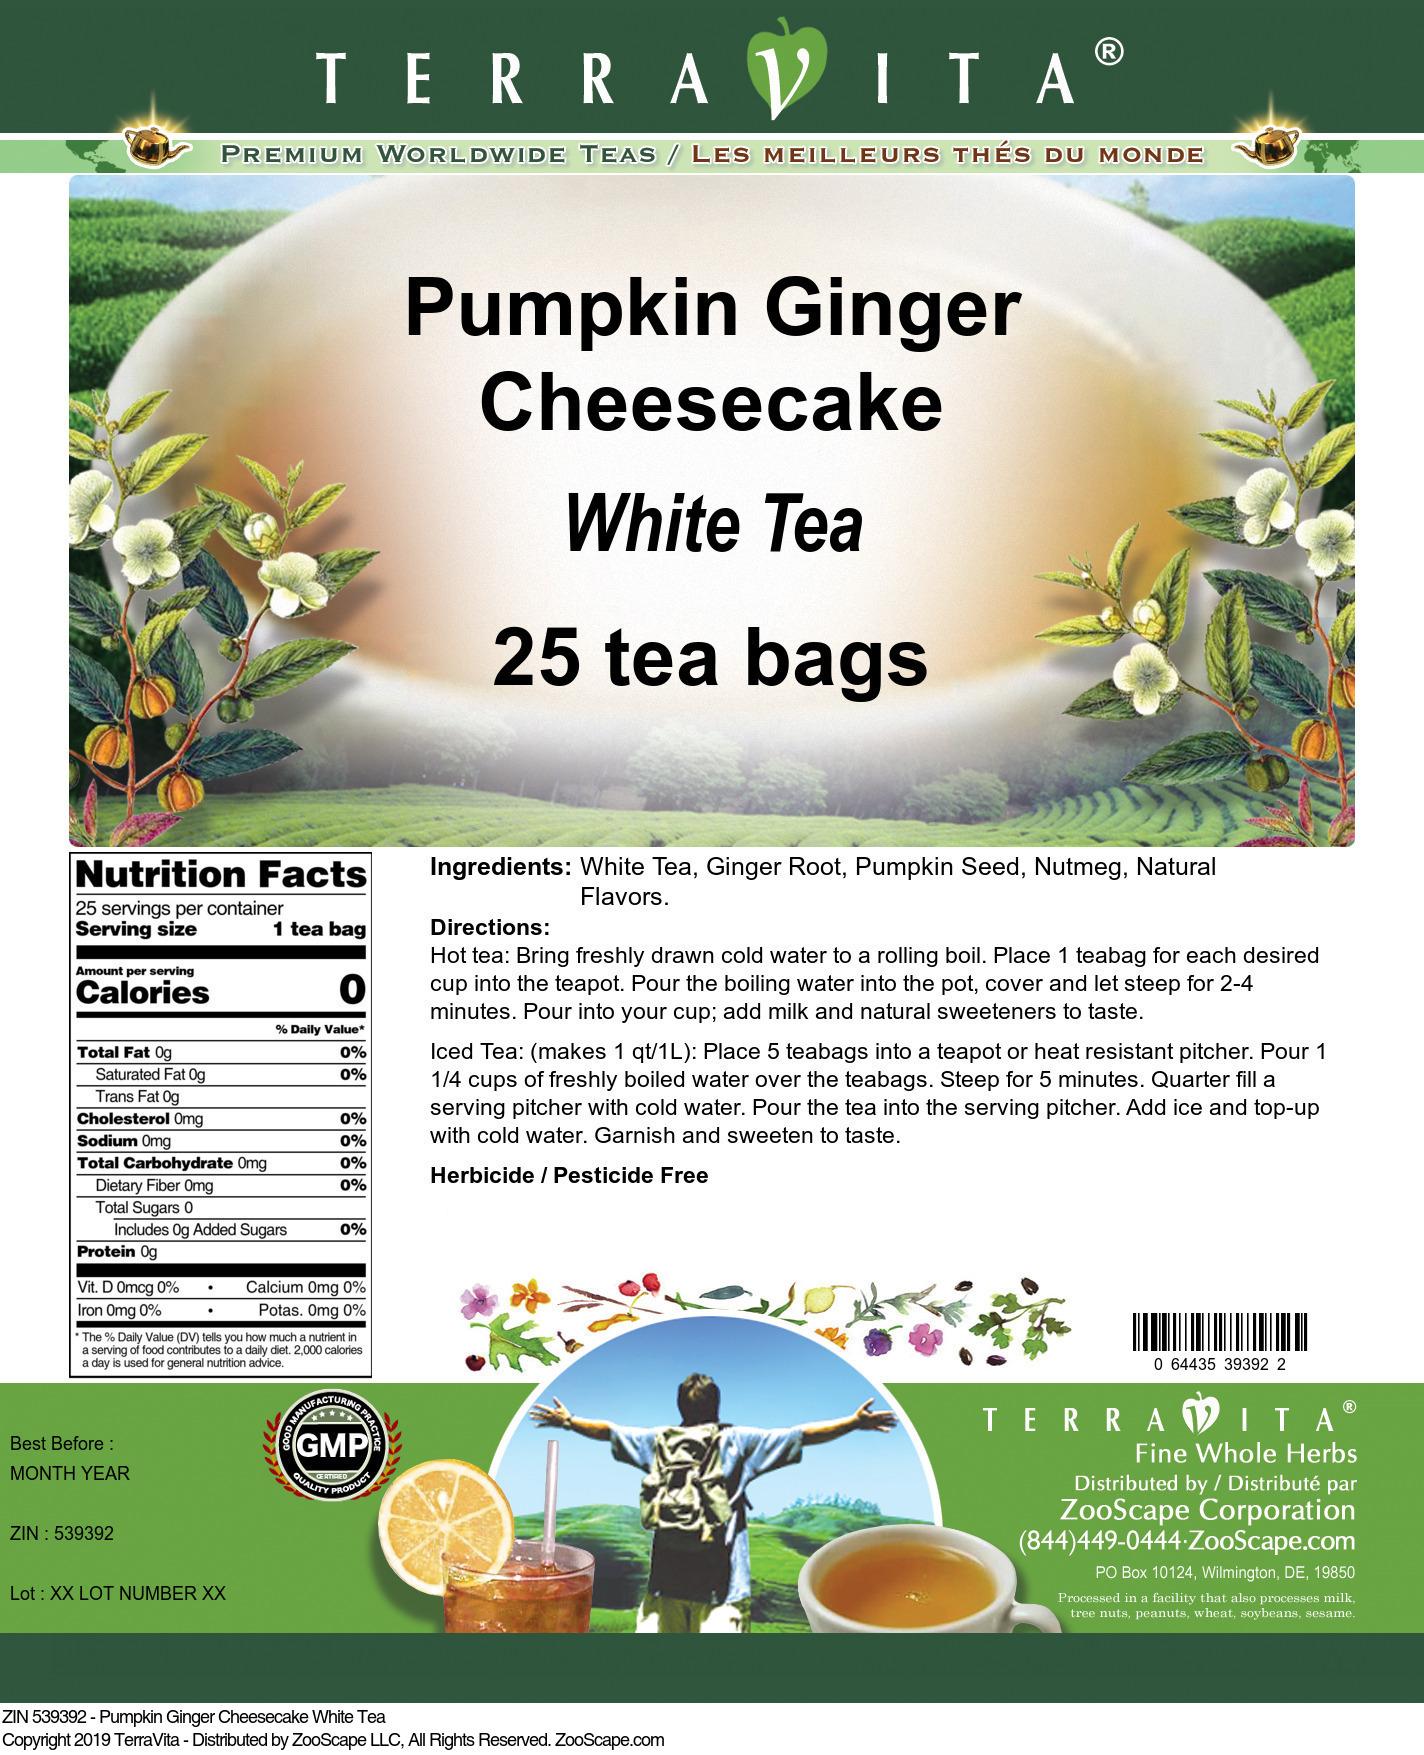 Pumpkin Ginger Cheesecake White Tea